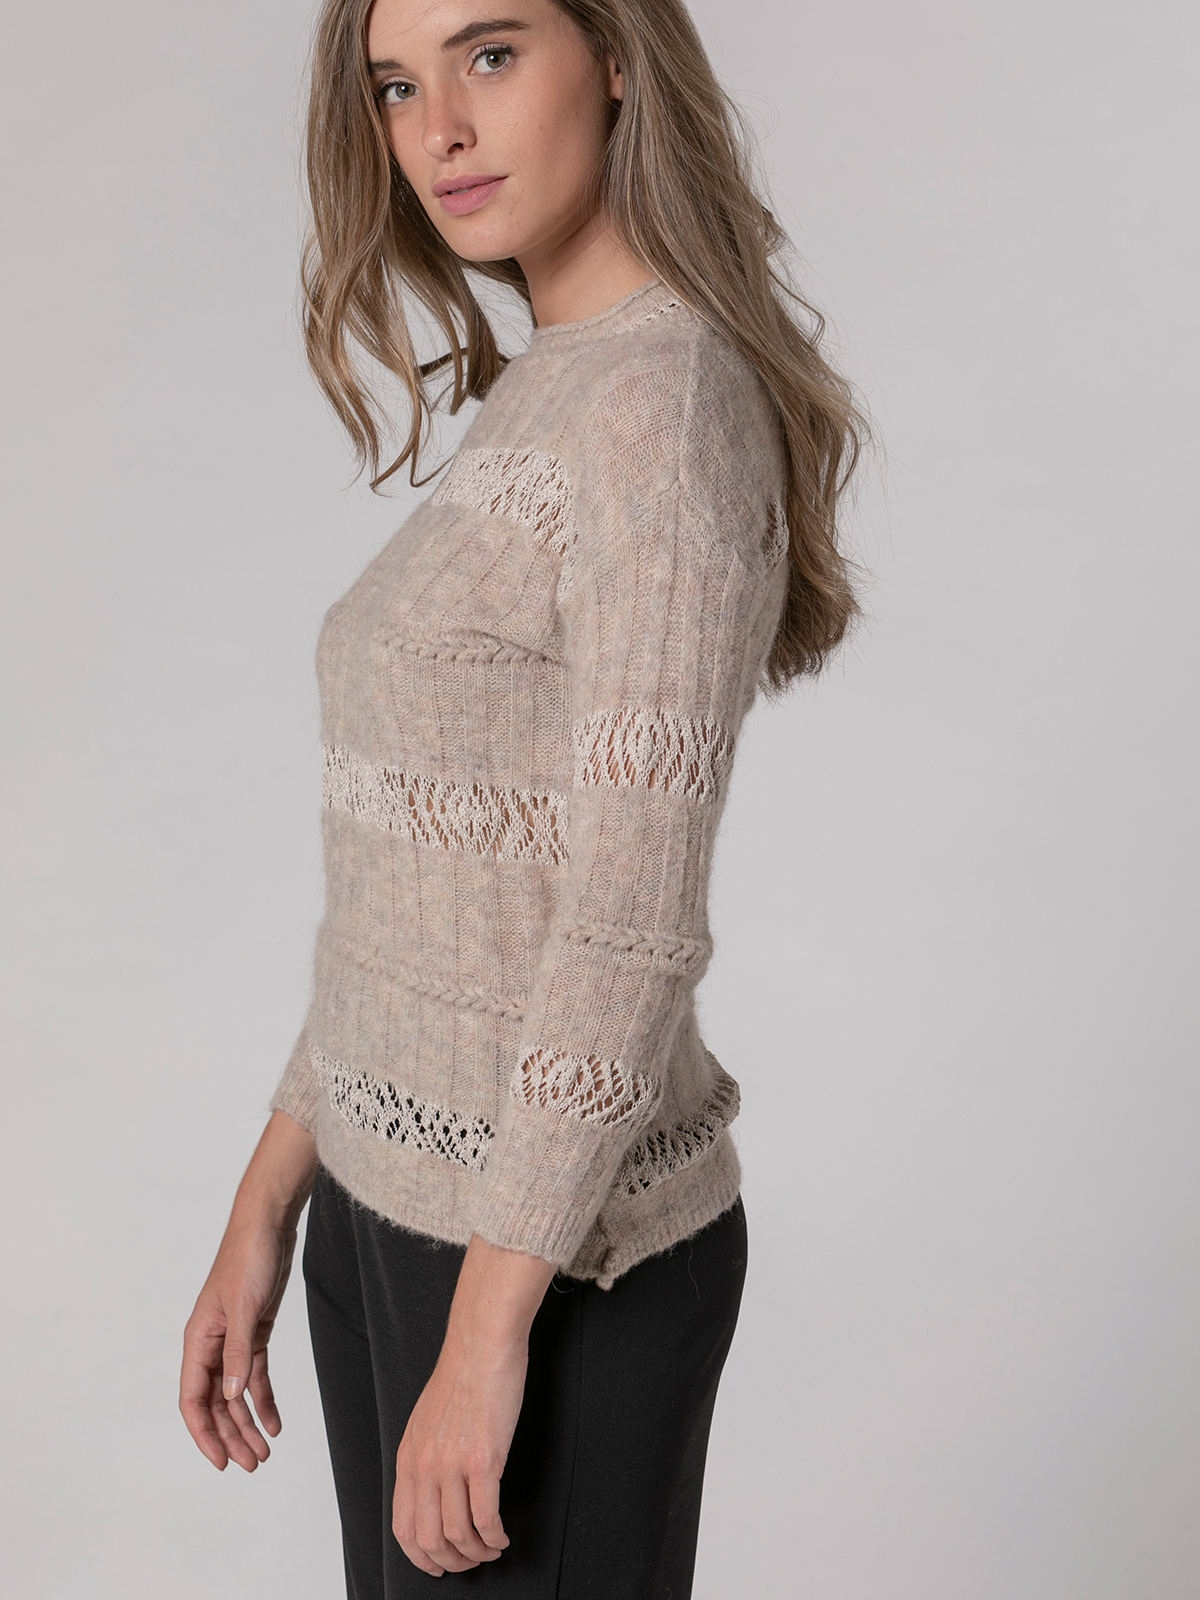 Jersey mujer cuello redondo lana algodón Beige